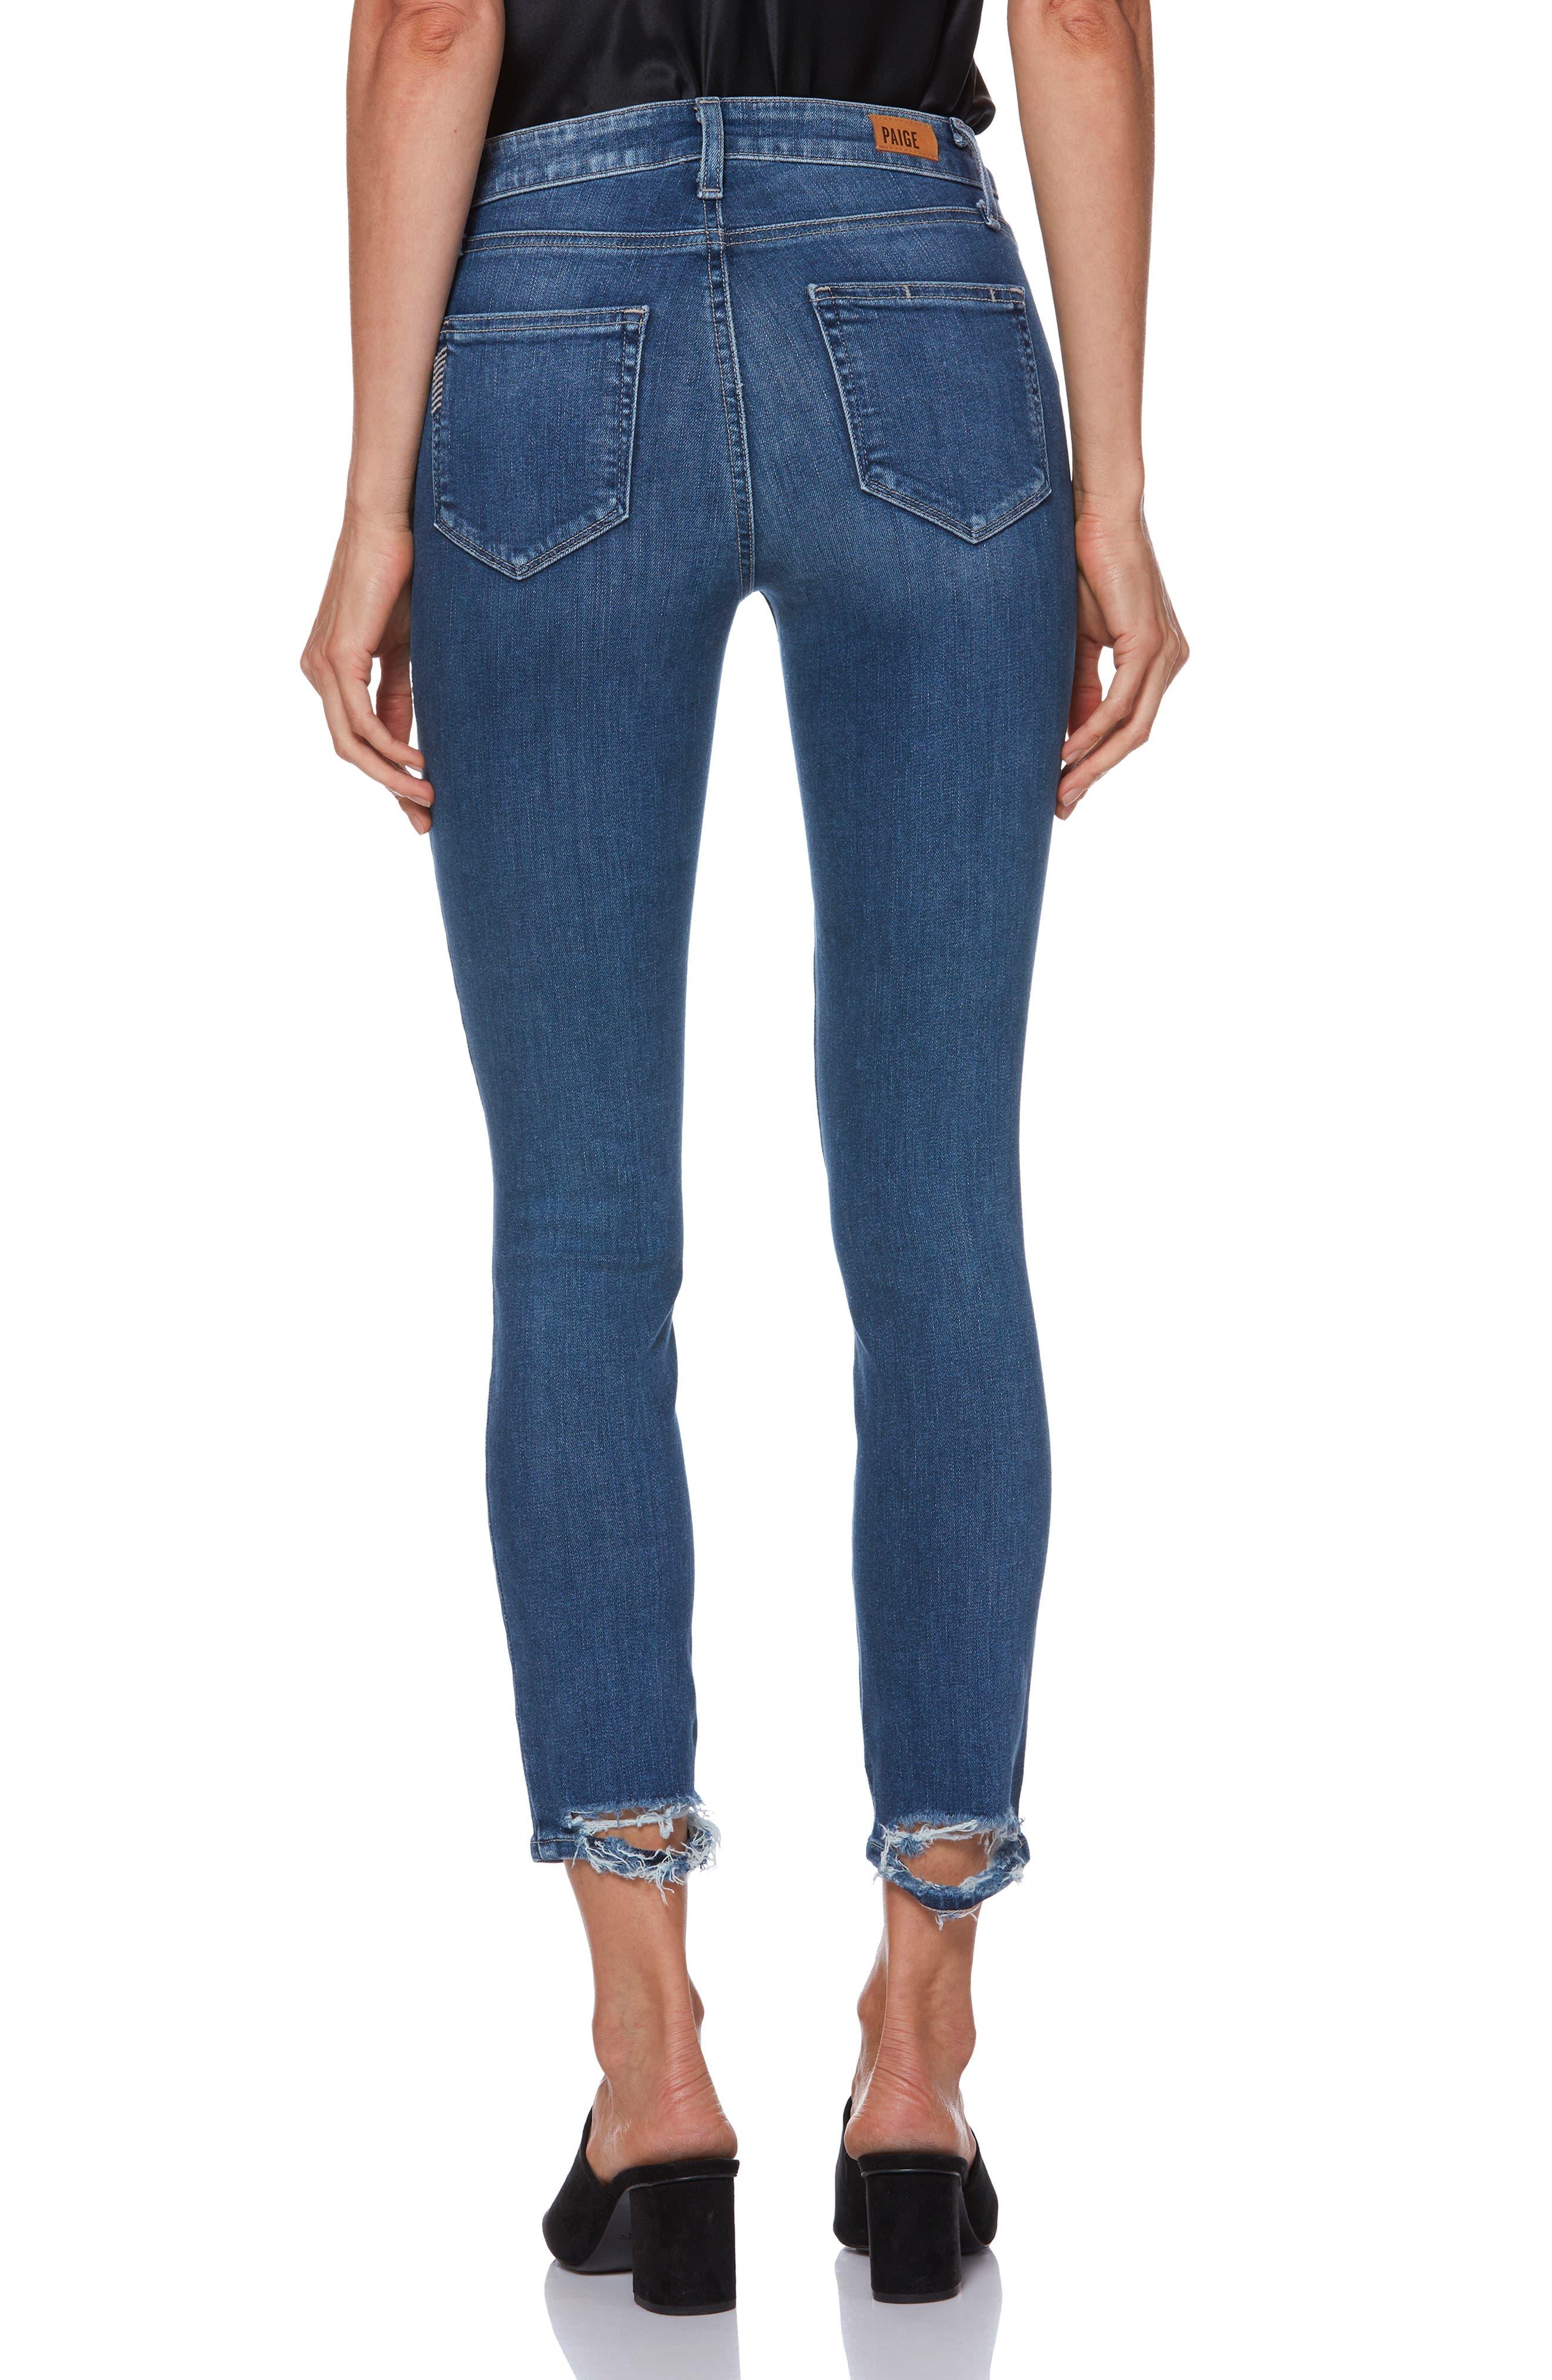 PAIGE, Hoxton Transcend Vintage High Waist Crop Skinny Jeans, Alternate thumbnail 2, color, 400